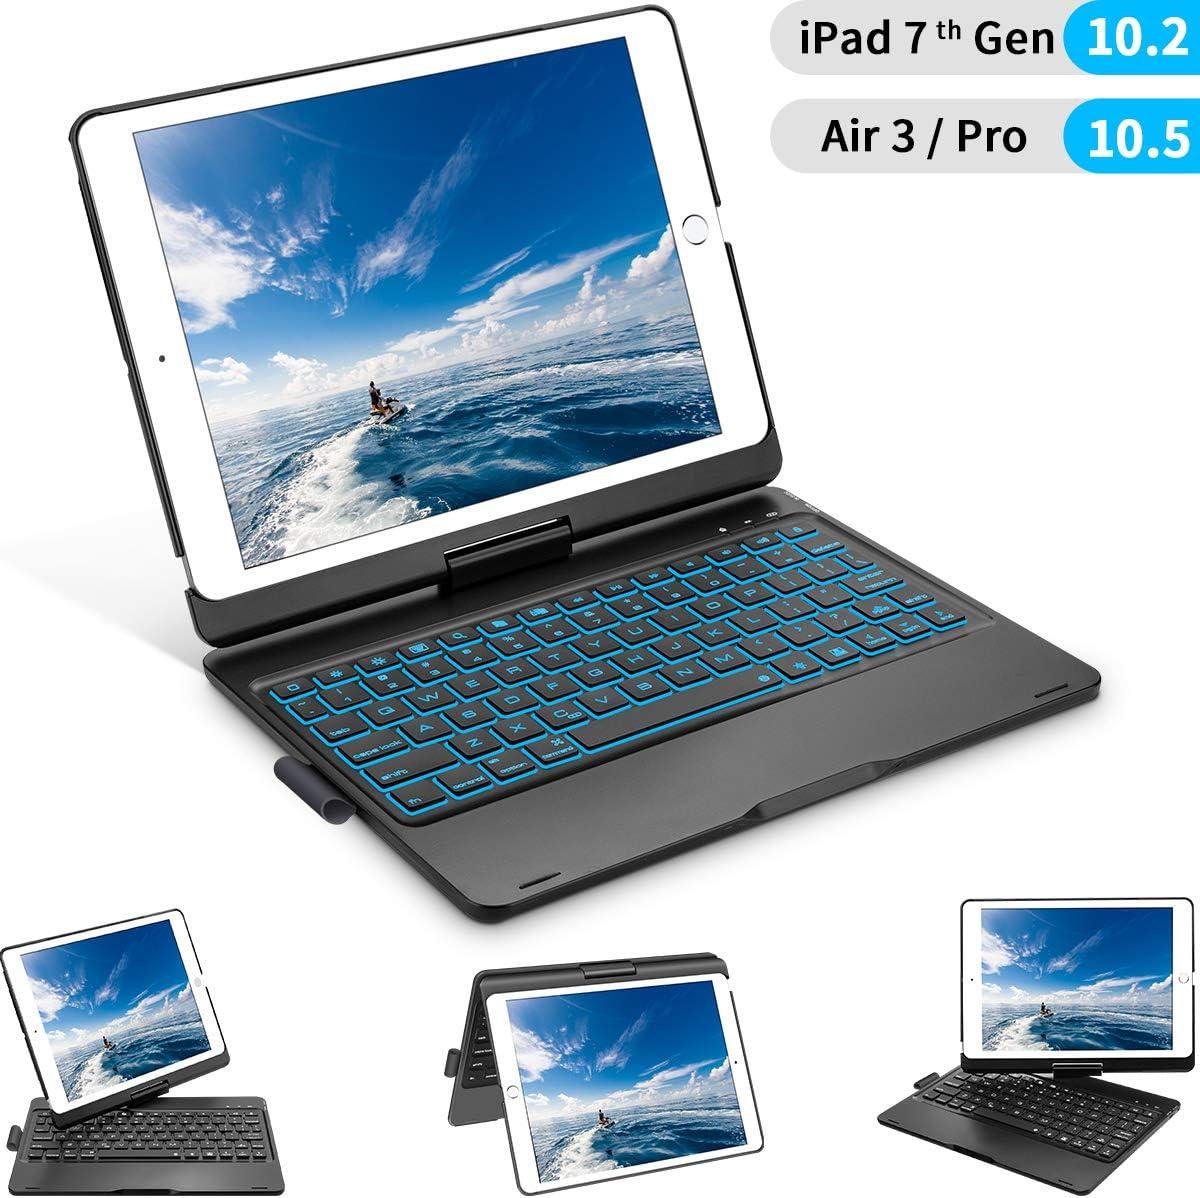 iPad 10.2 7th Generation 2019 Keyboard Case, iPad Keyboard Case for iPad 10.2 2019, iPad Air 3 10.5 2019, iPad Pro 10.5 2017, 360 Rotation, 7 Colors Backlight, with Apple Pencil Holder – Black